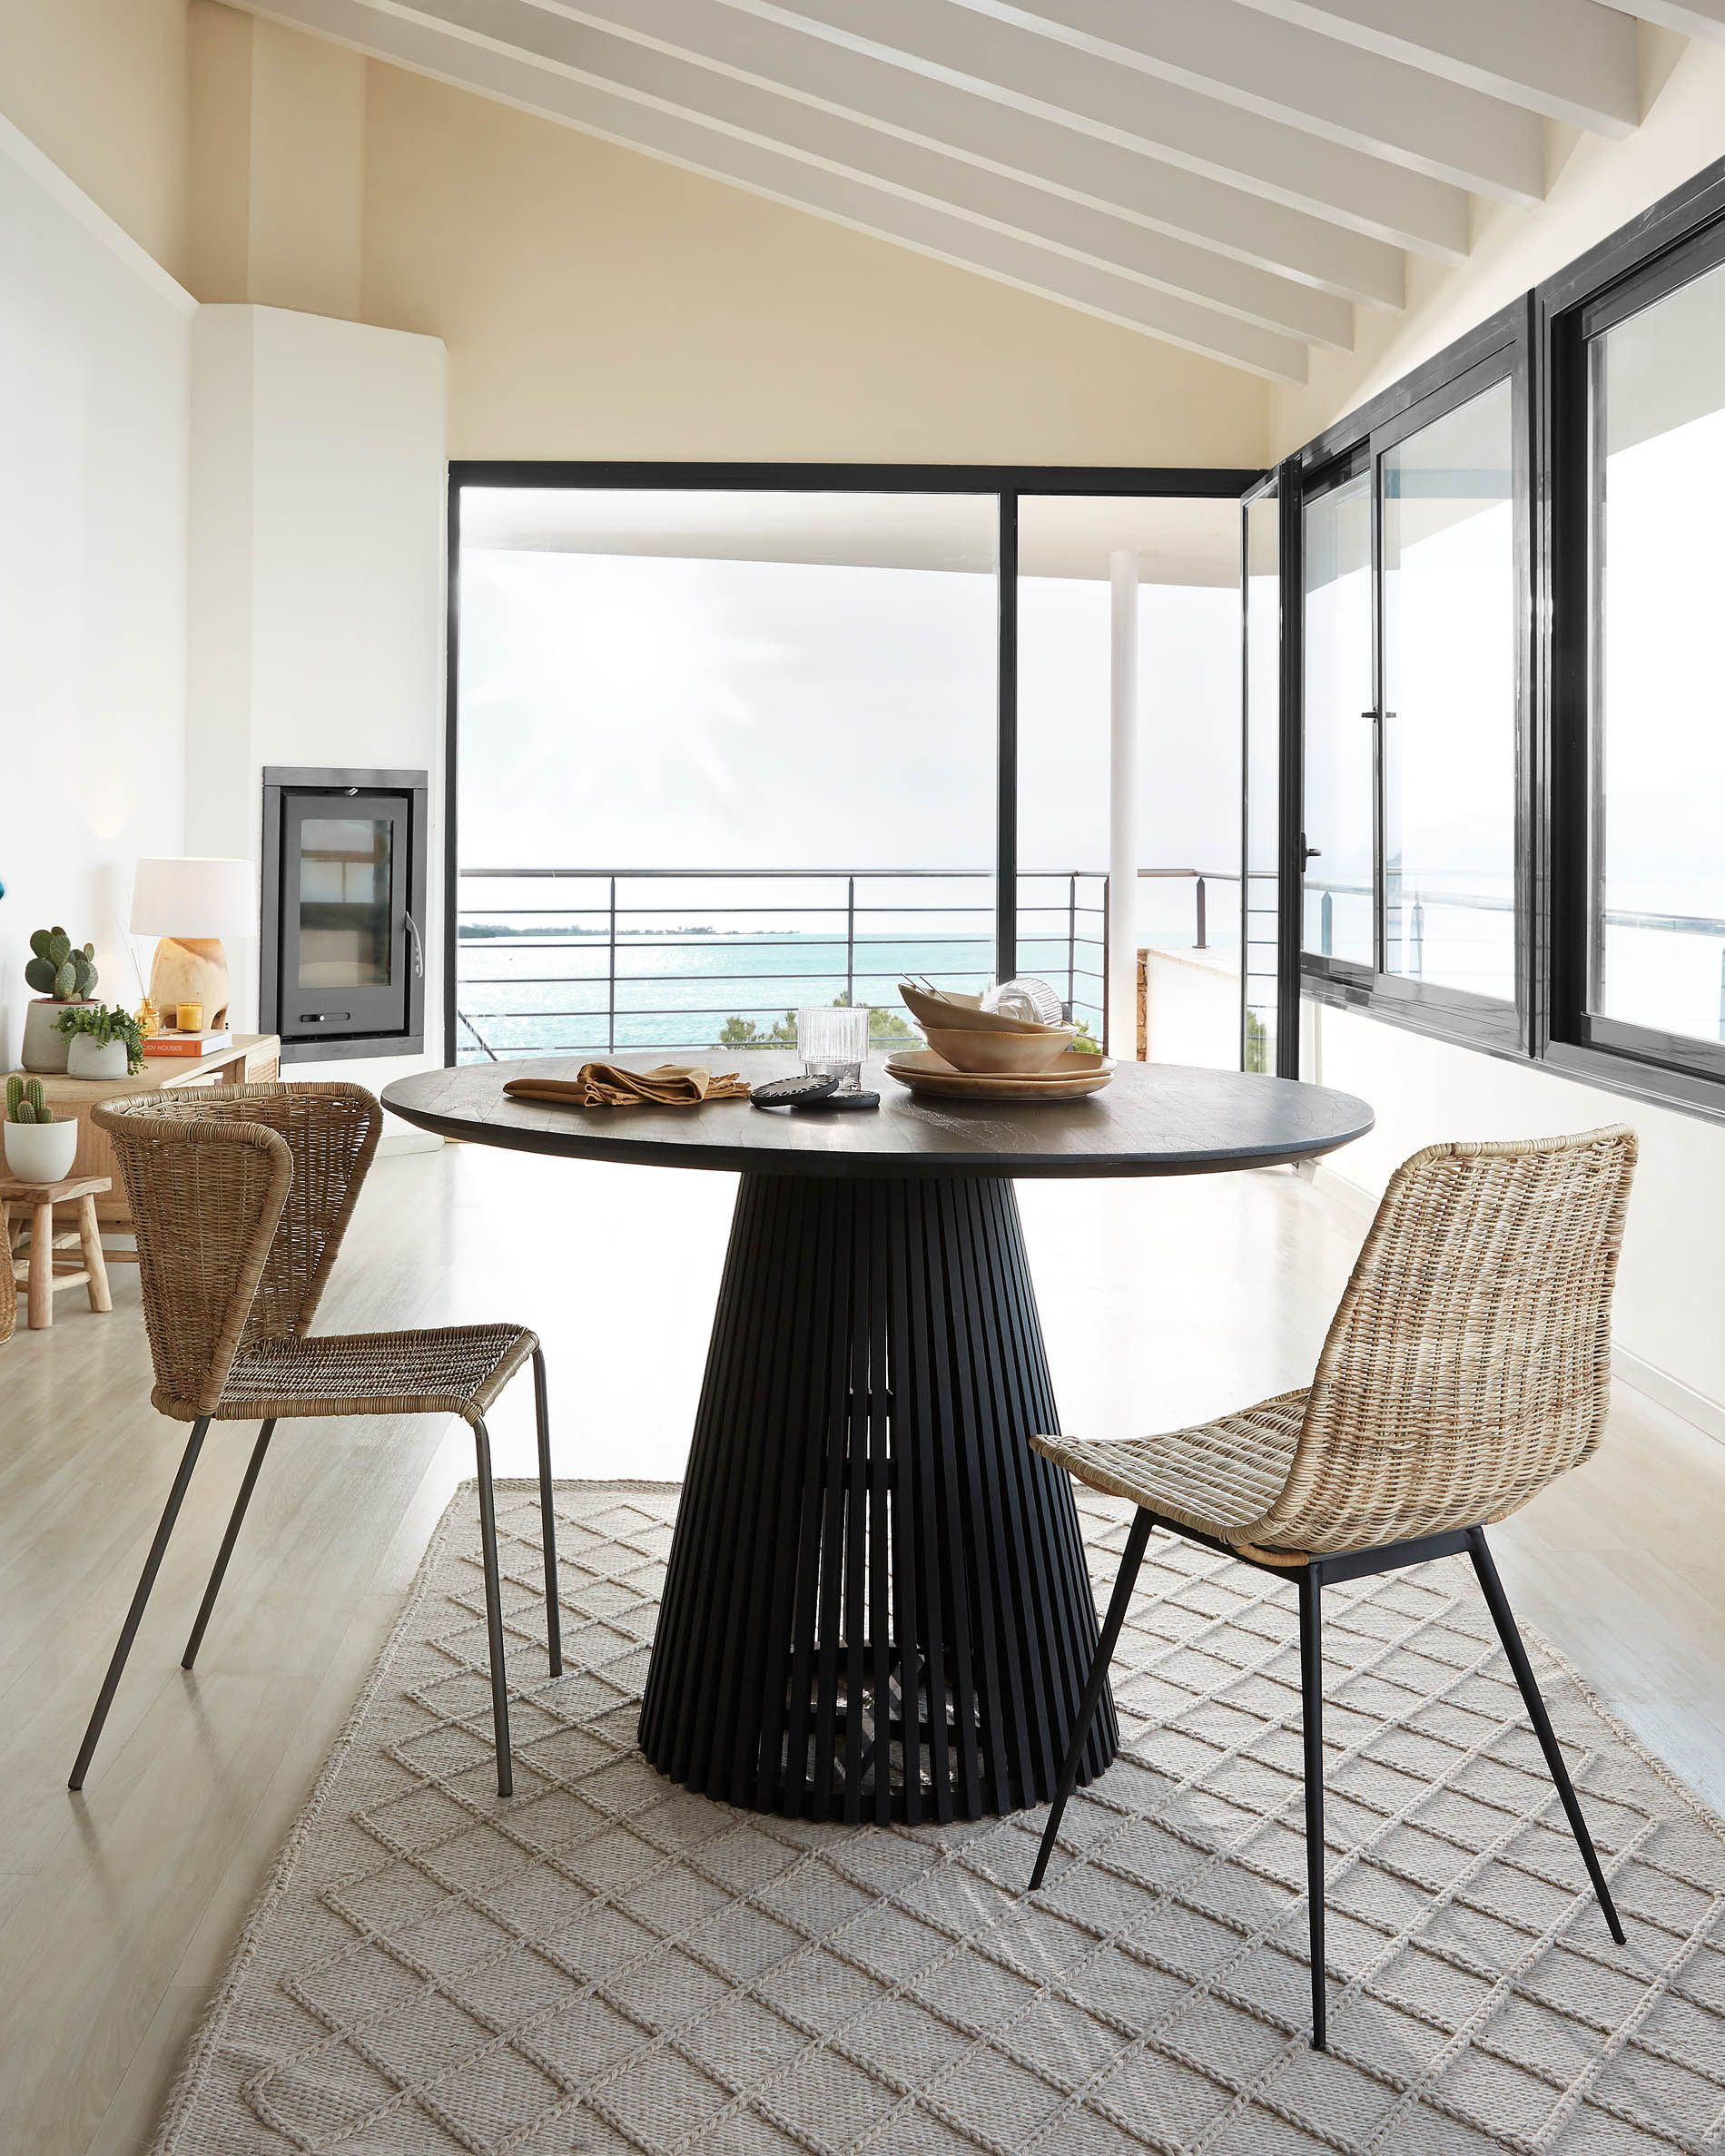 Jeanette Ø 120 Cm Black Table | Kave Home® intérieur Kave Home